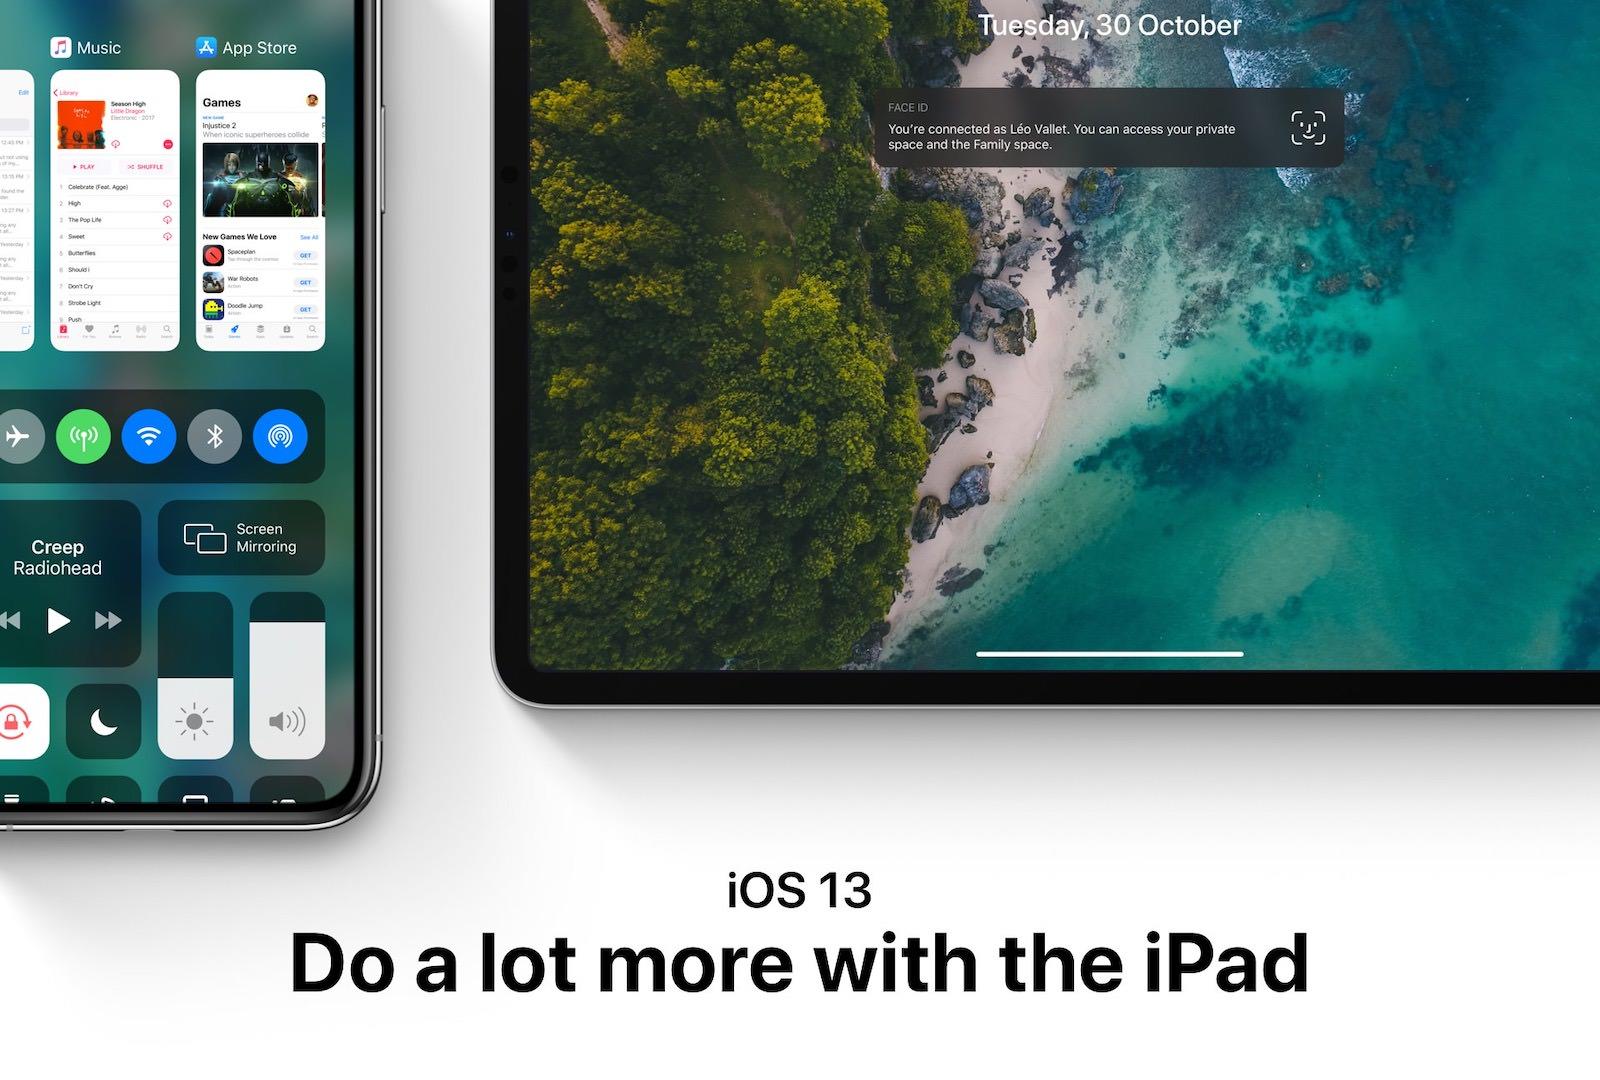 IOS 13 concept image 1